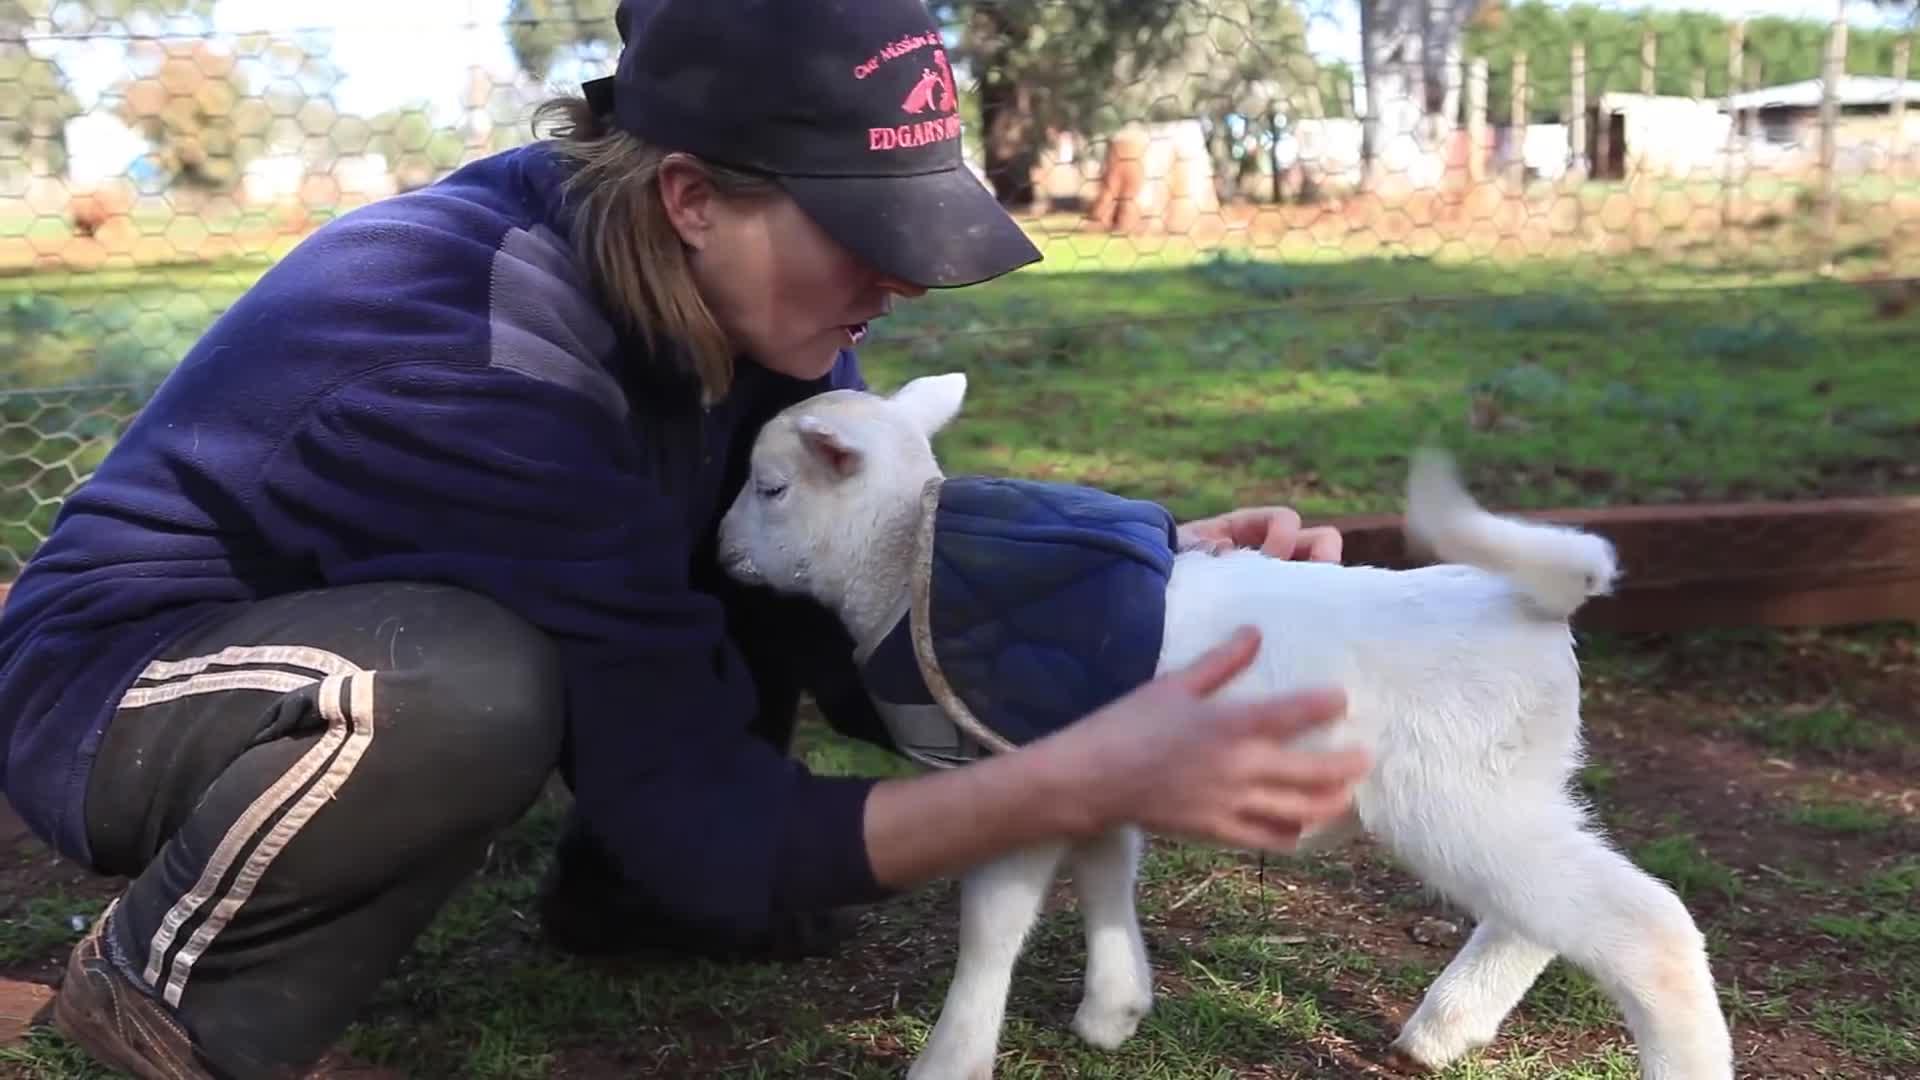 cute, edgarsmission, farm sanctuary, funny, lamb, laugh, rescue, rescued animals, sheep, tickels, Lamb Lamb Style GIFs